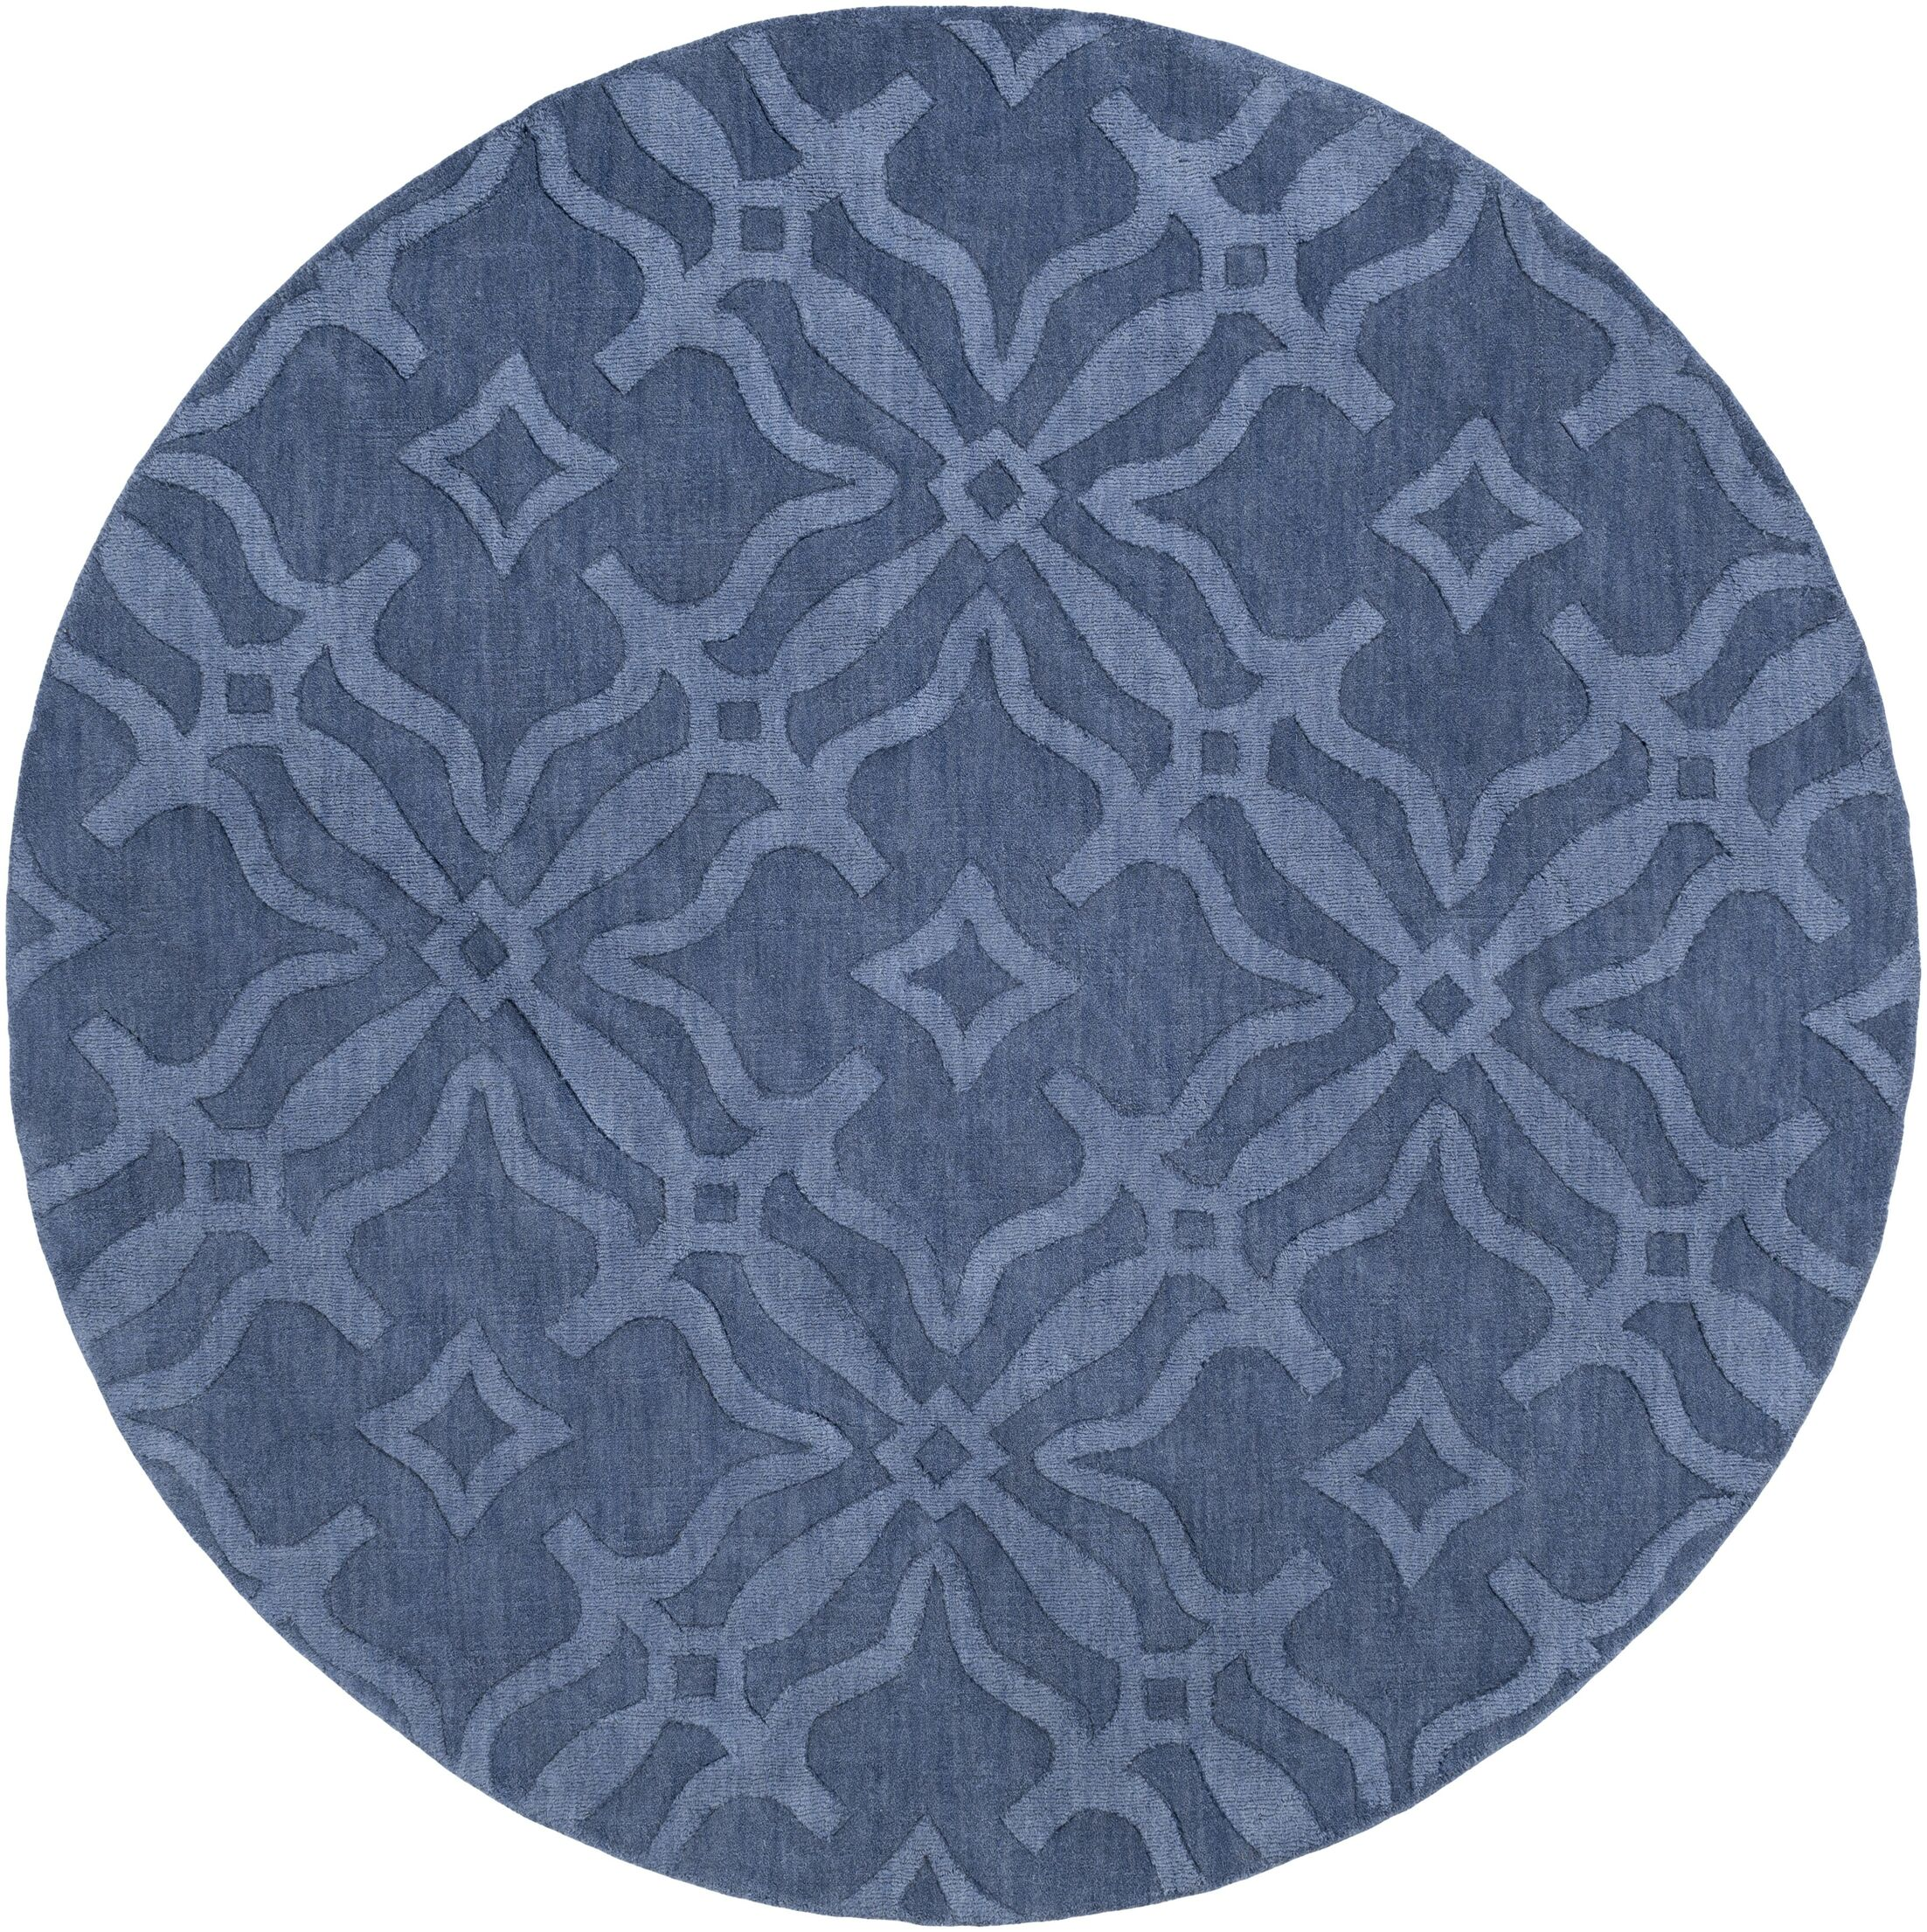 Dutchess Handmade Blue Area Rug Rug Size: Round 9'9